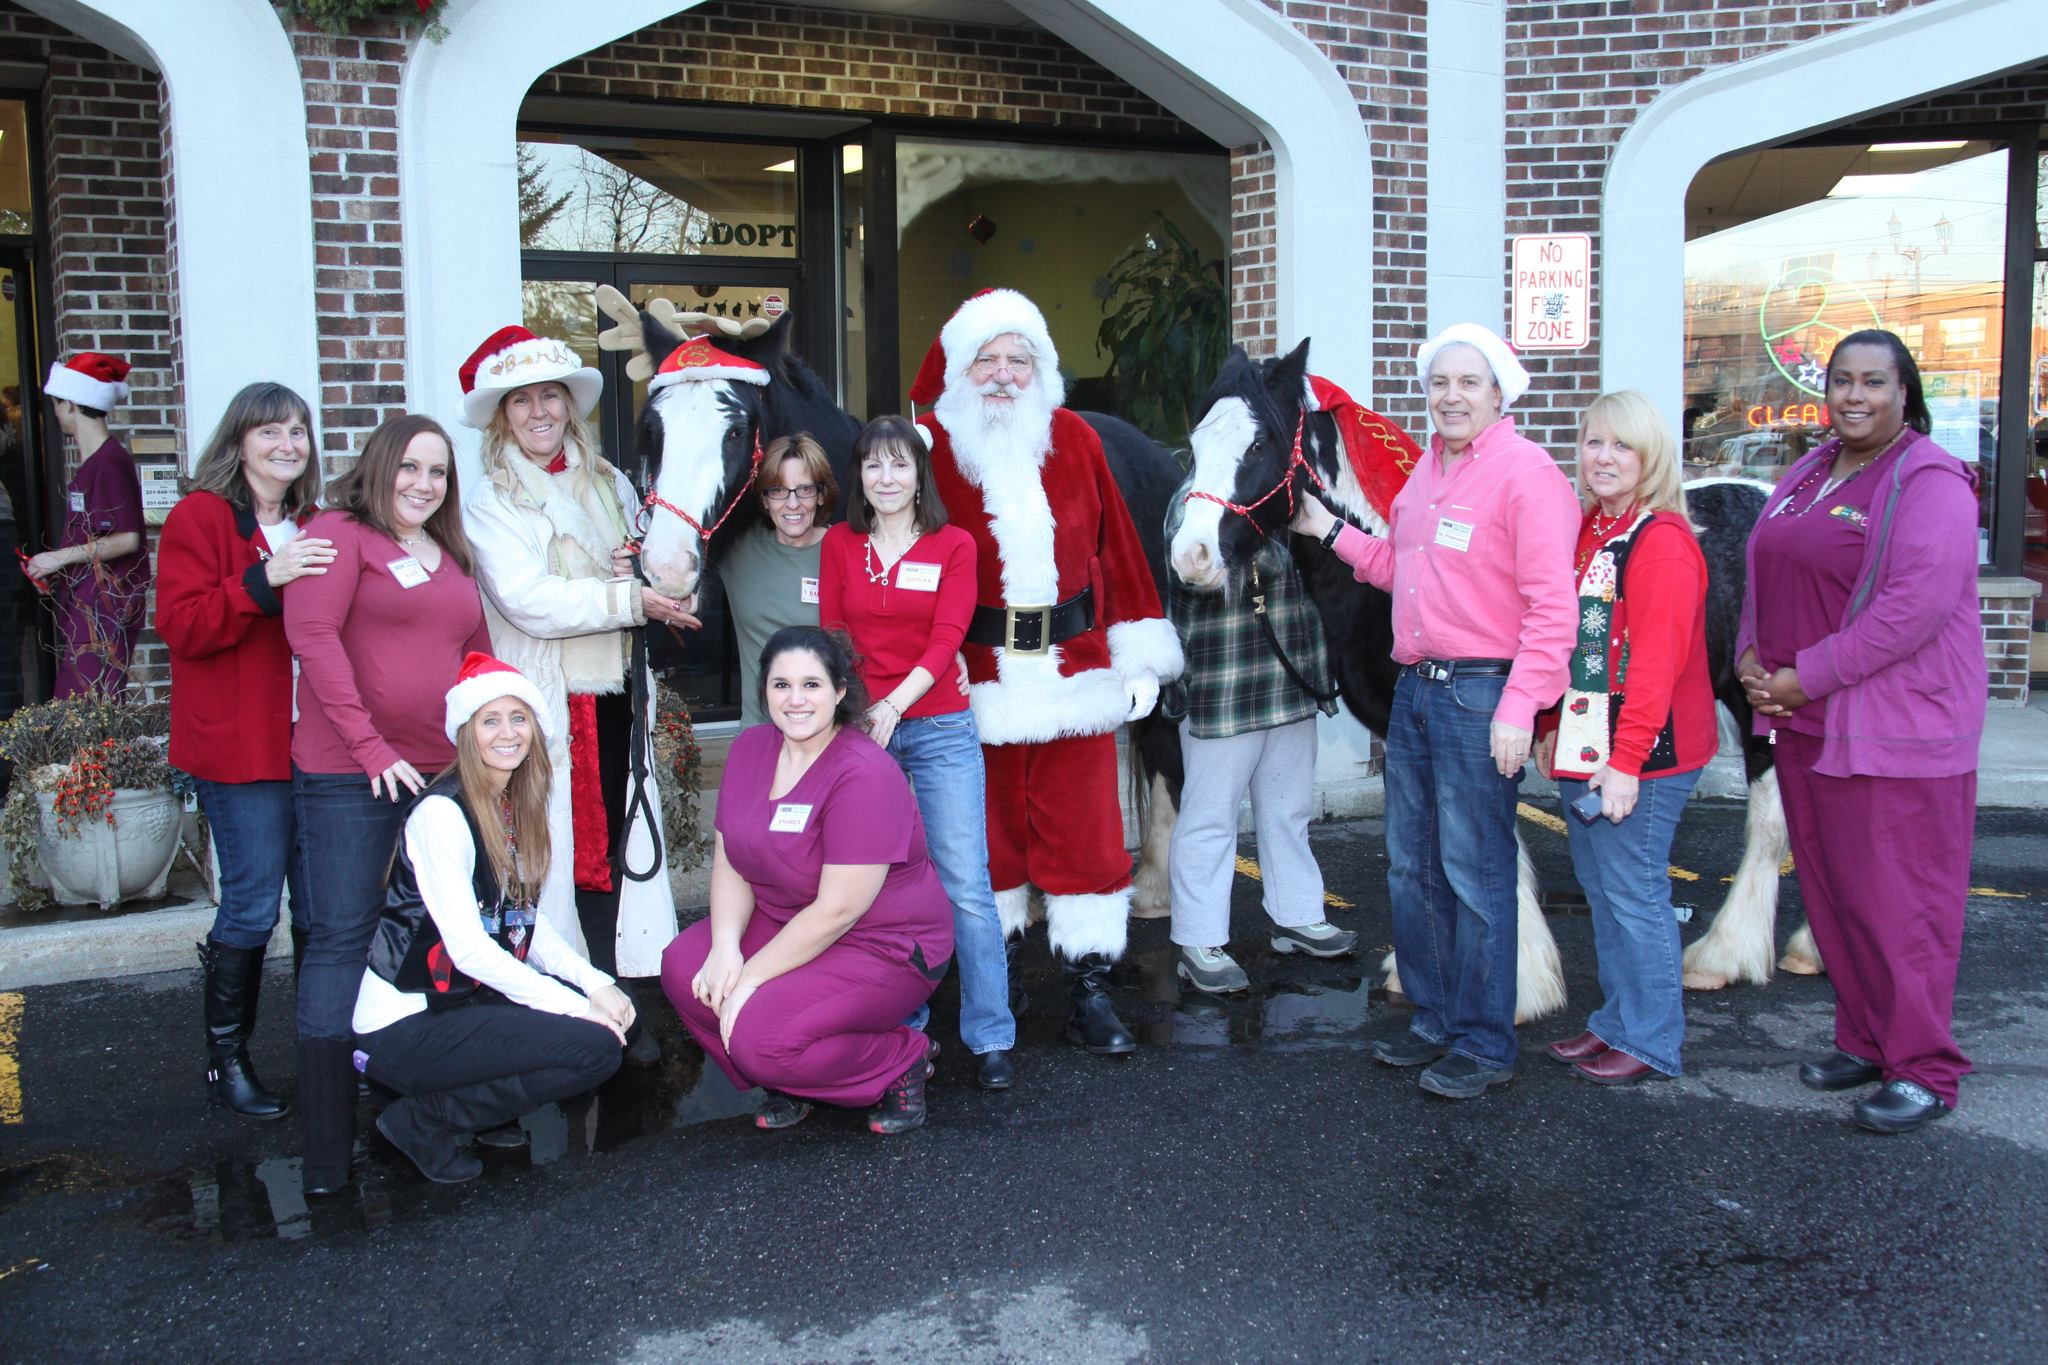 Franklin lakes Animal Hospital Santa with Gastone, Maxx, Barbara and Flah Staff 12-7-13